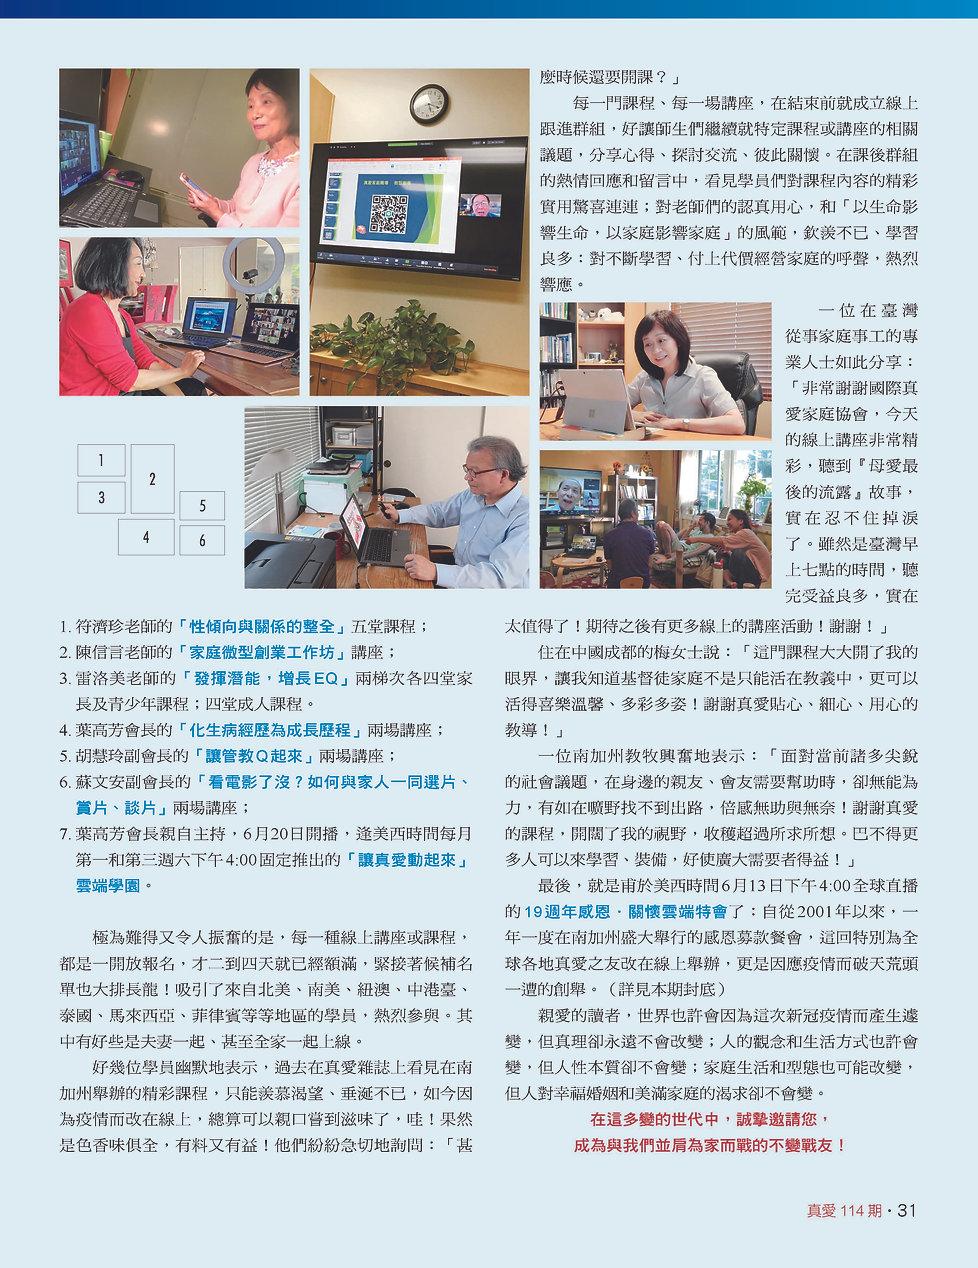 FK114P29-31_Page_3.jpg